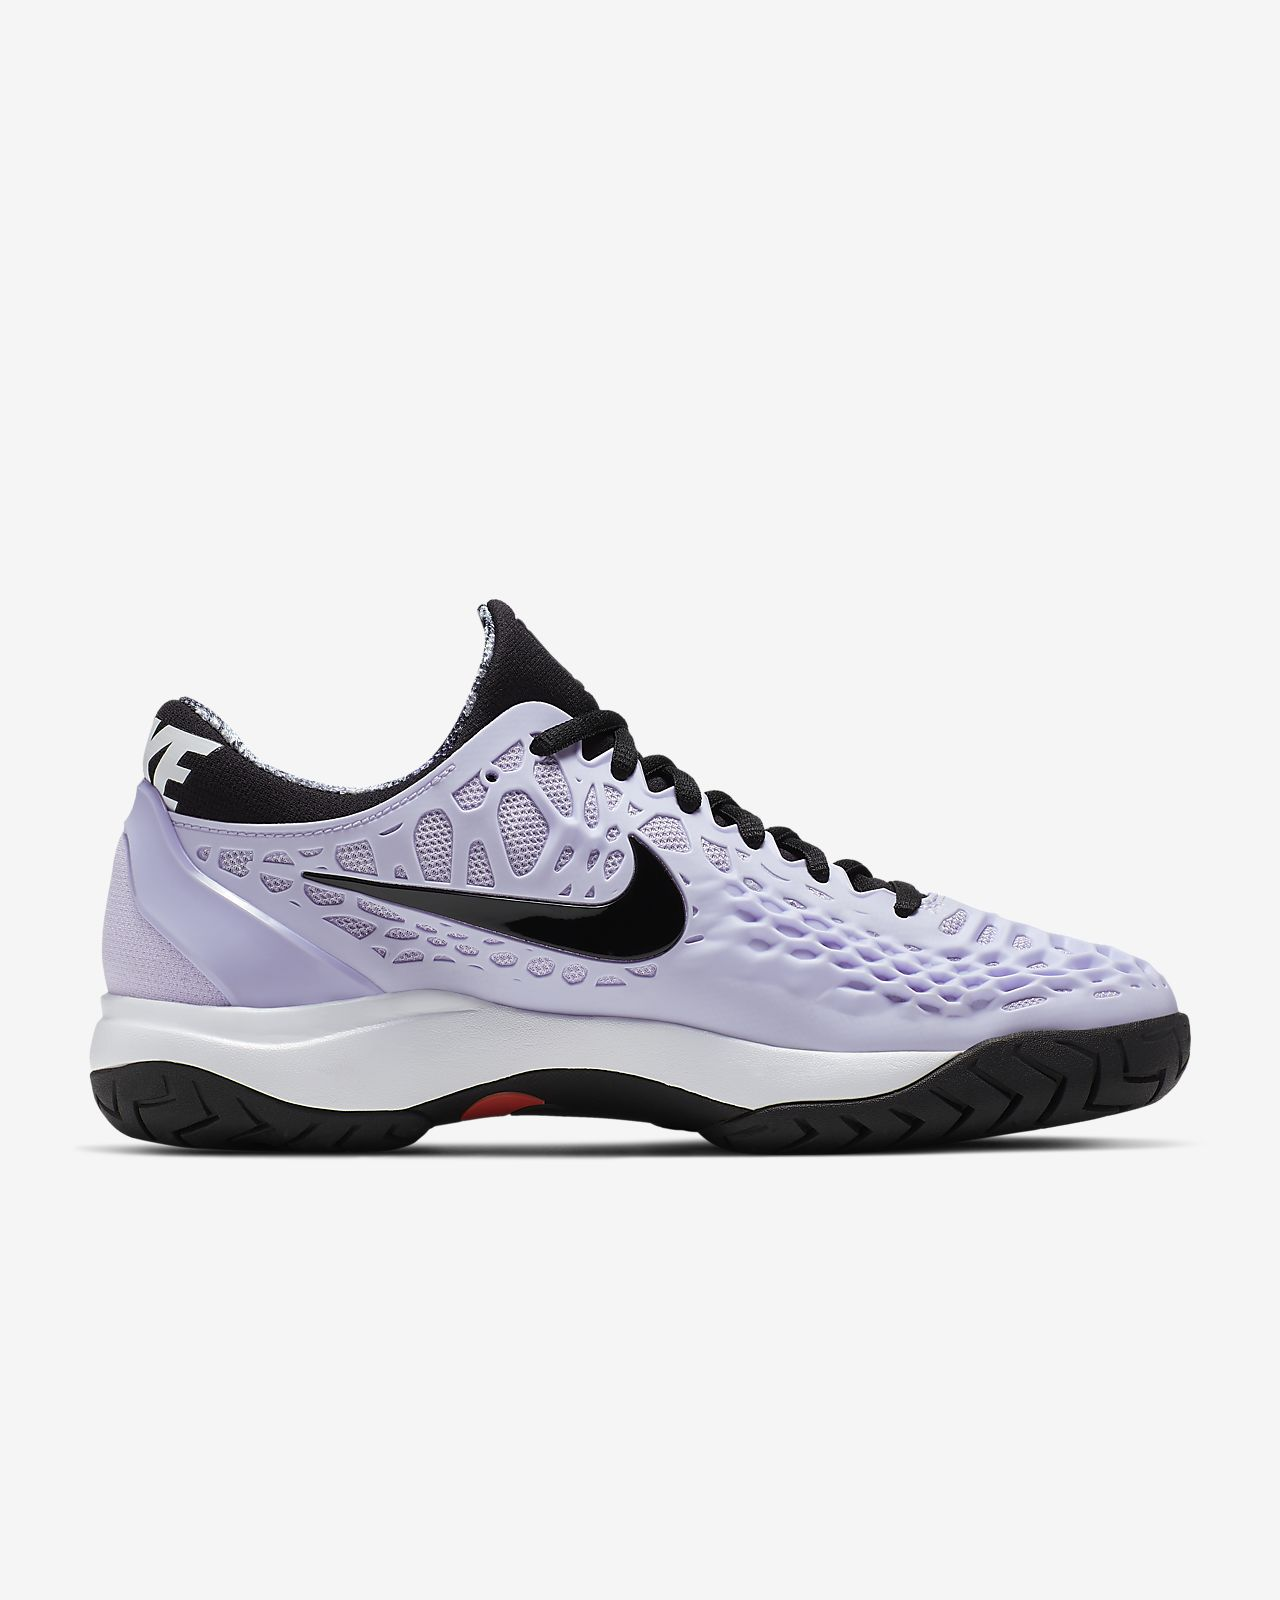 387253313979 NikeCourt Zoom Cage 3 Women's Hard Court Tennis Shoe. Nike.com AU